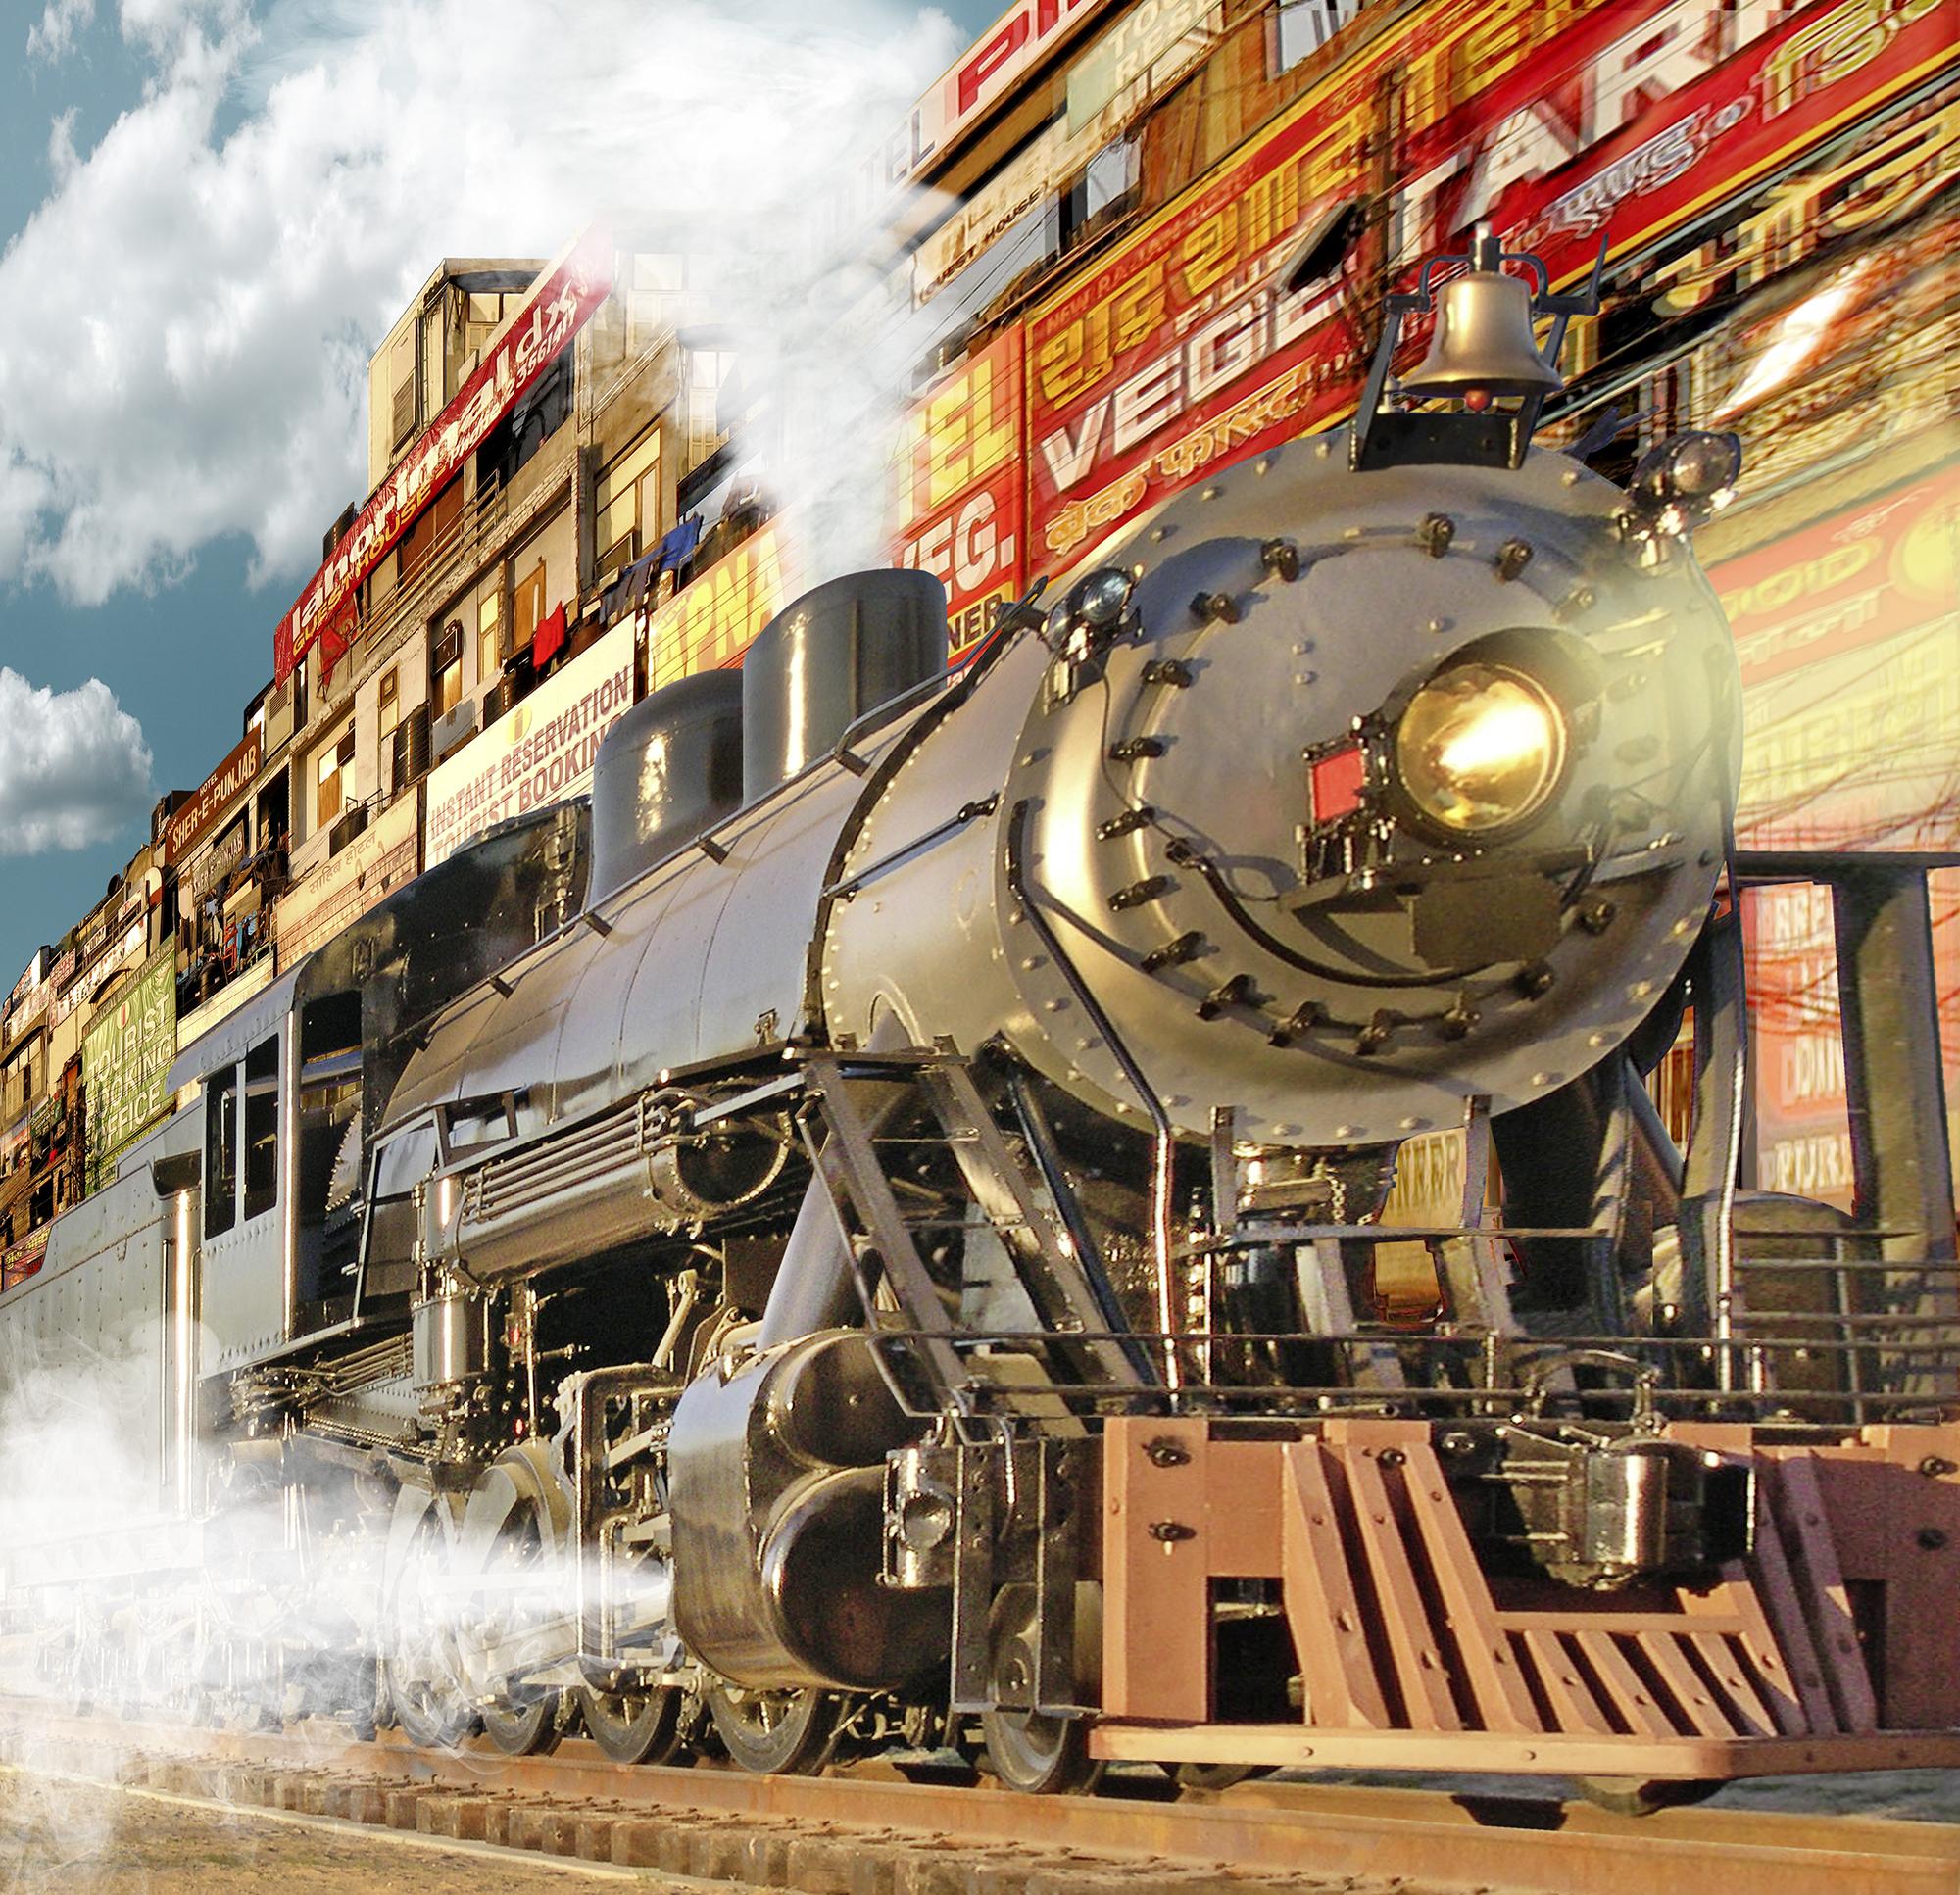 Mumbay Express